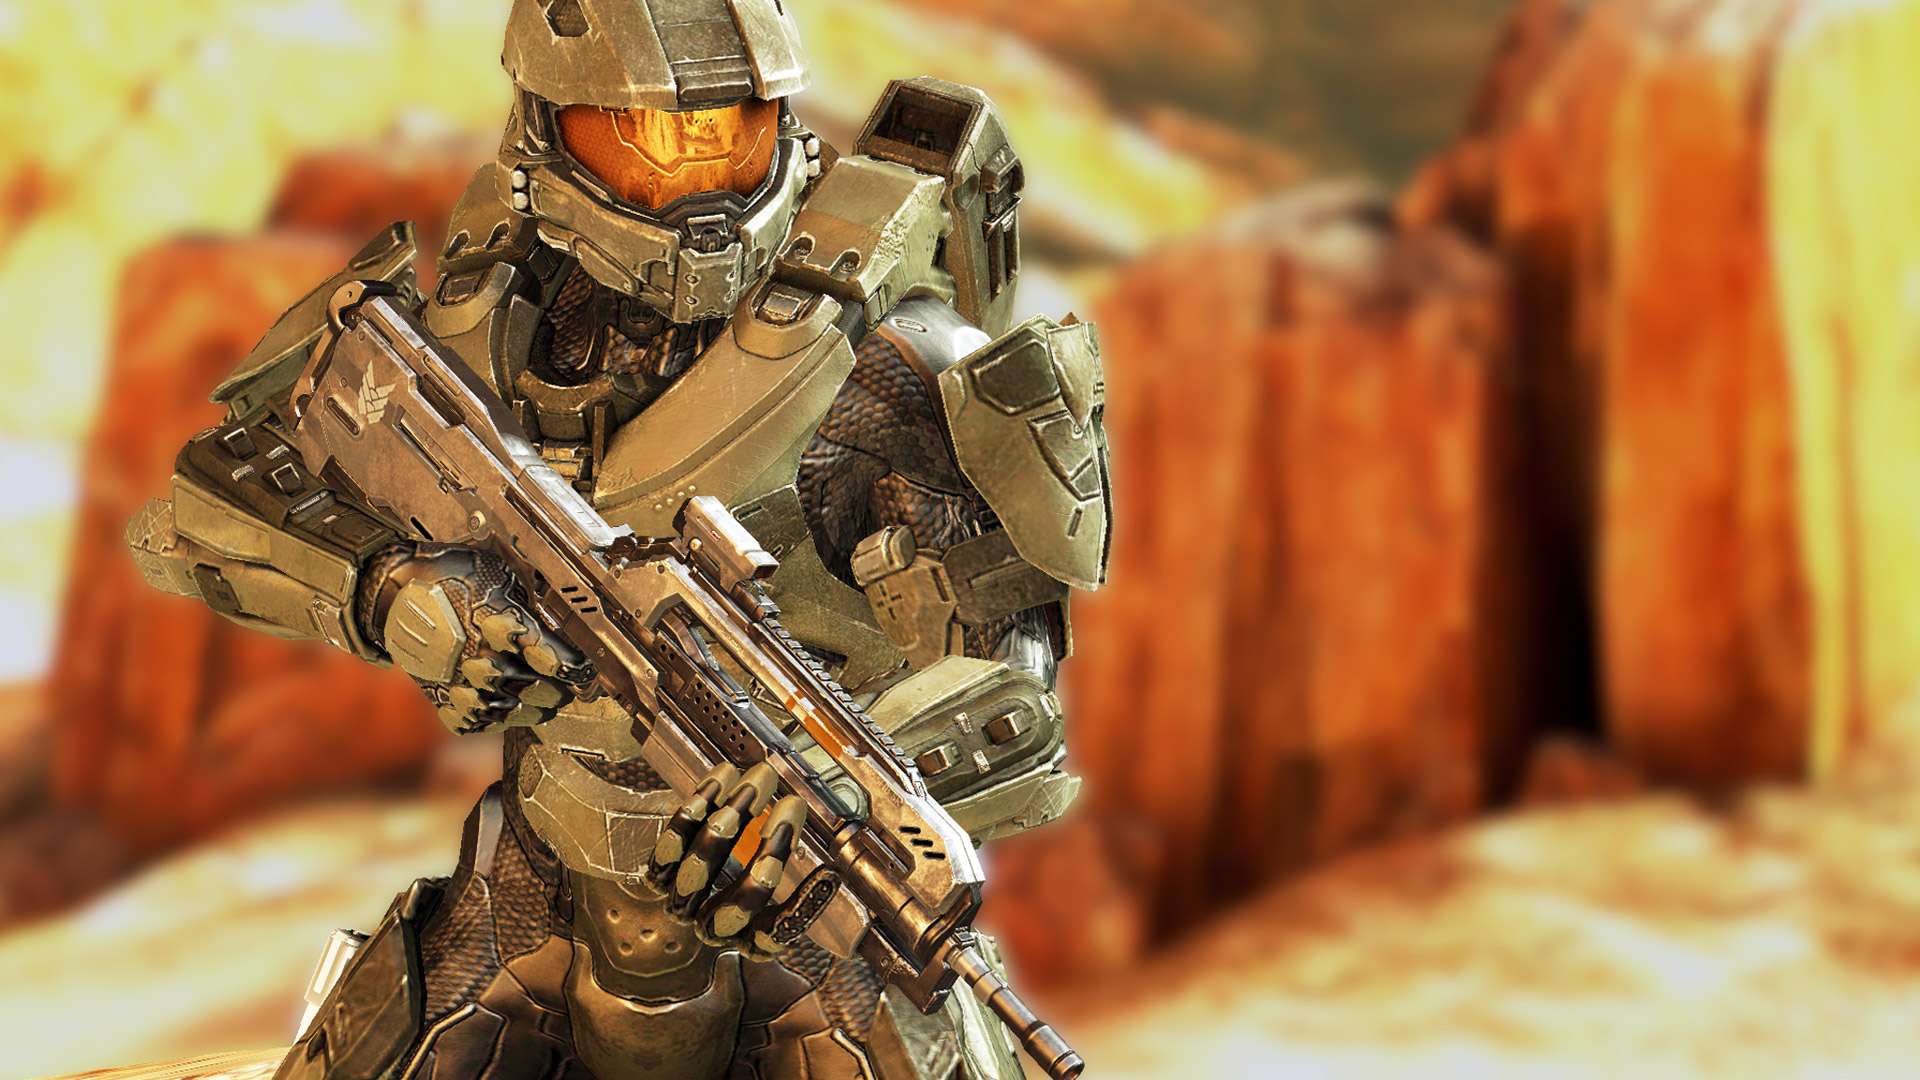 Master Chief Halo 4 Hd Wallpaper